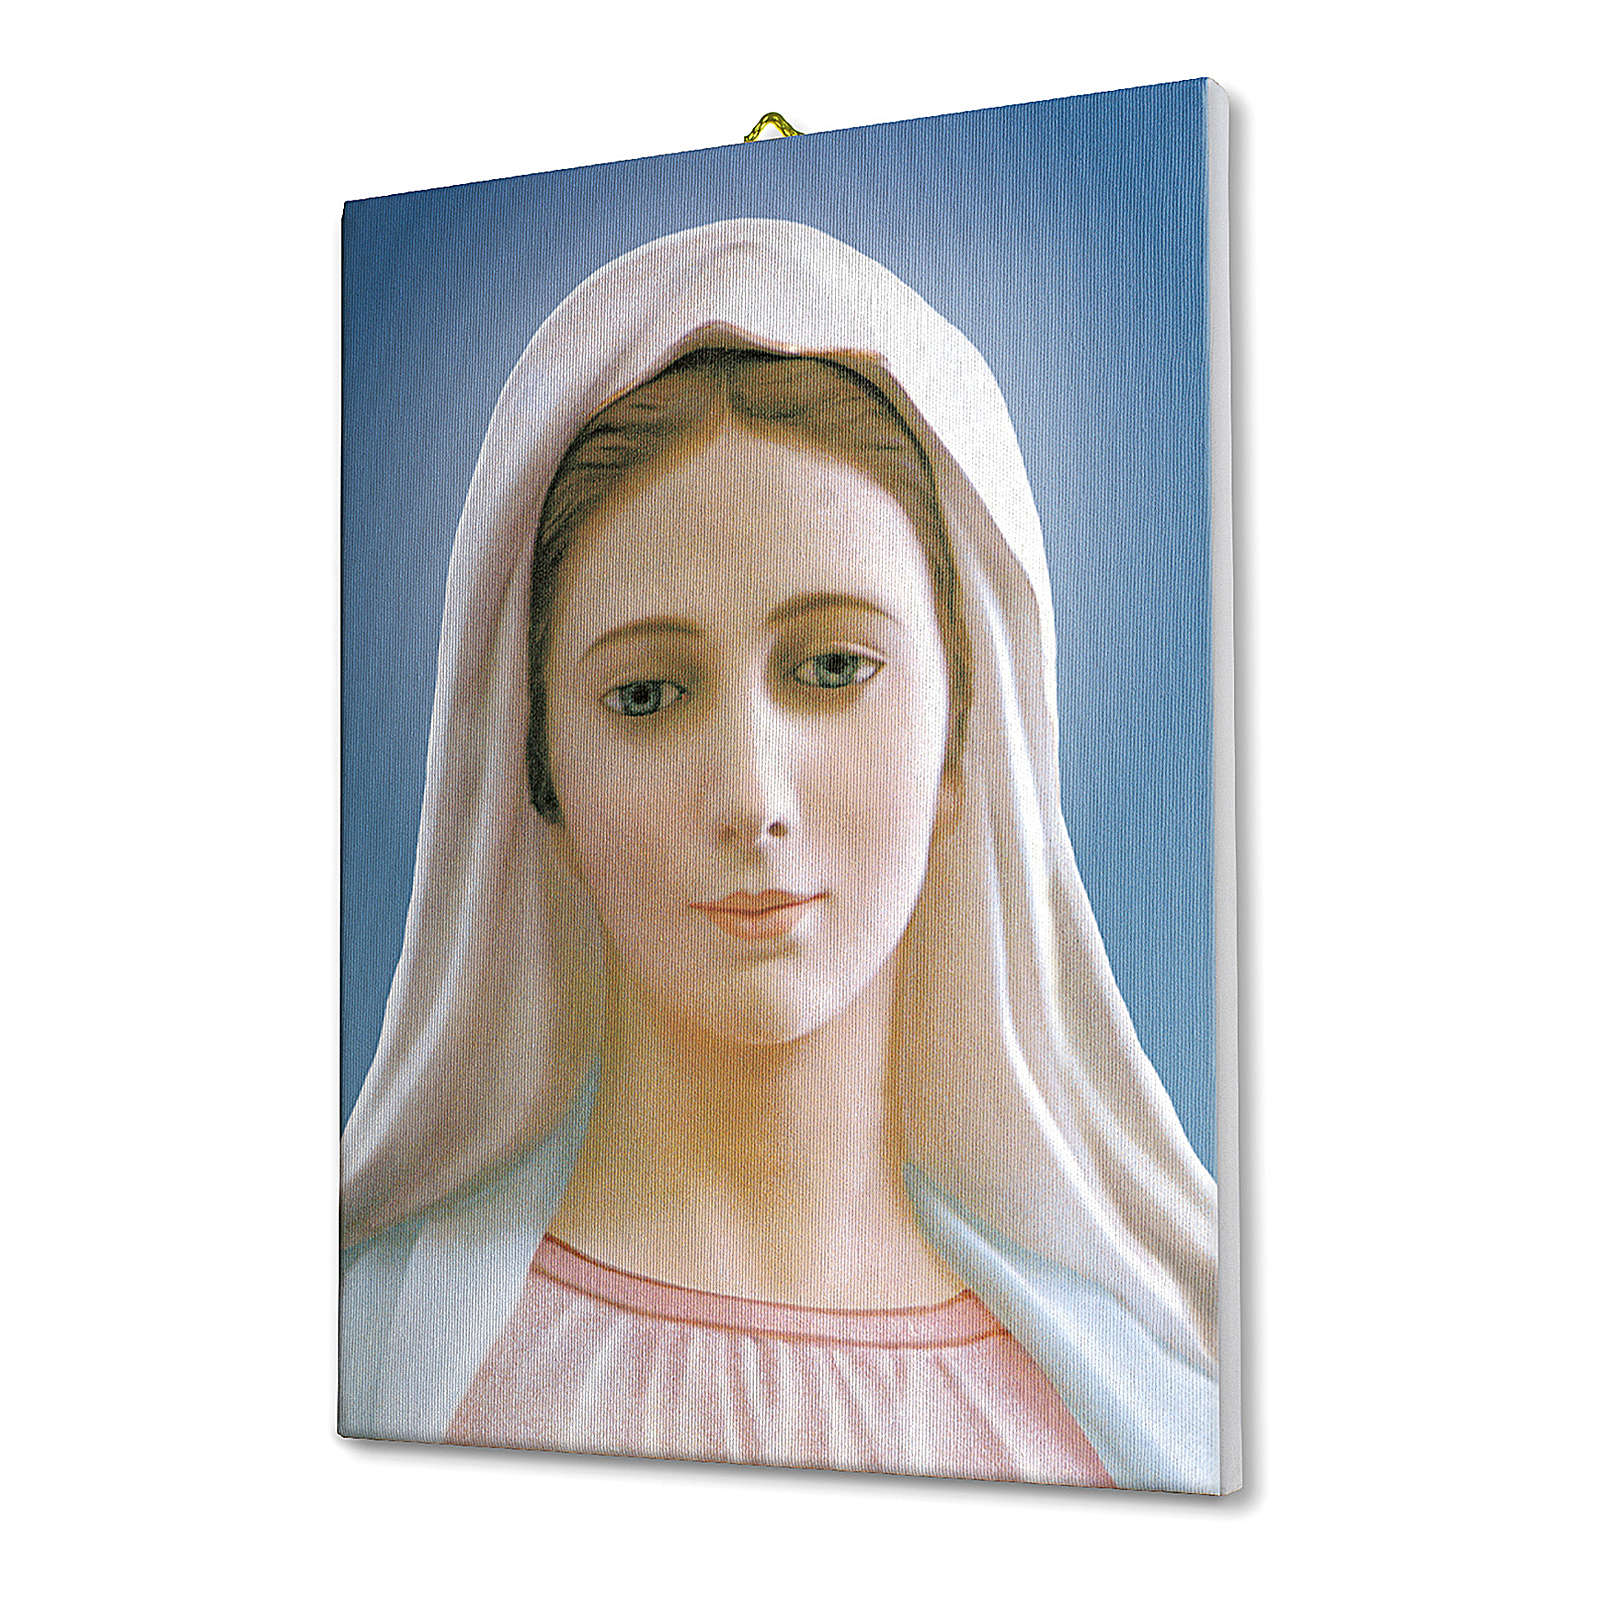 Cuadro sobre tela pictórica Virgen de Medjugorje 25x20 cm 3